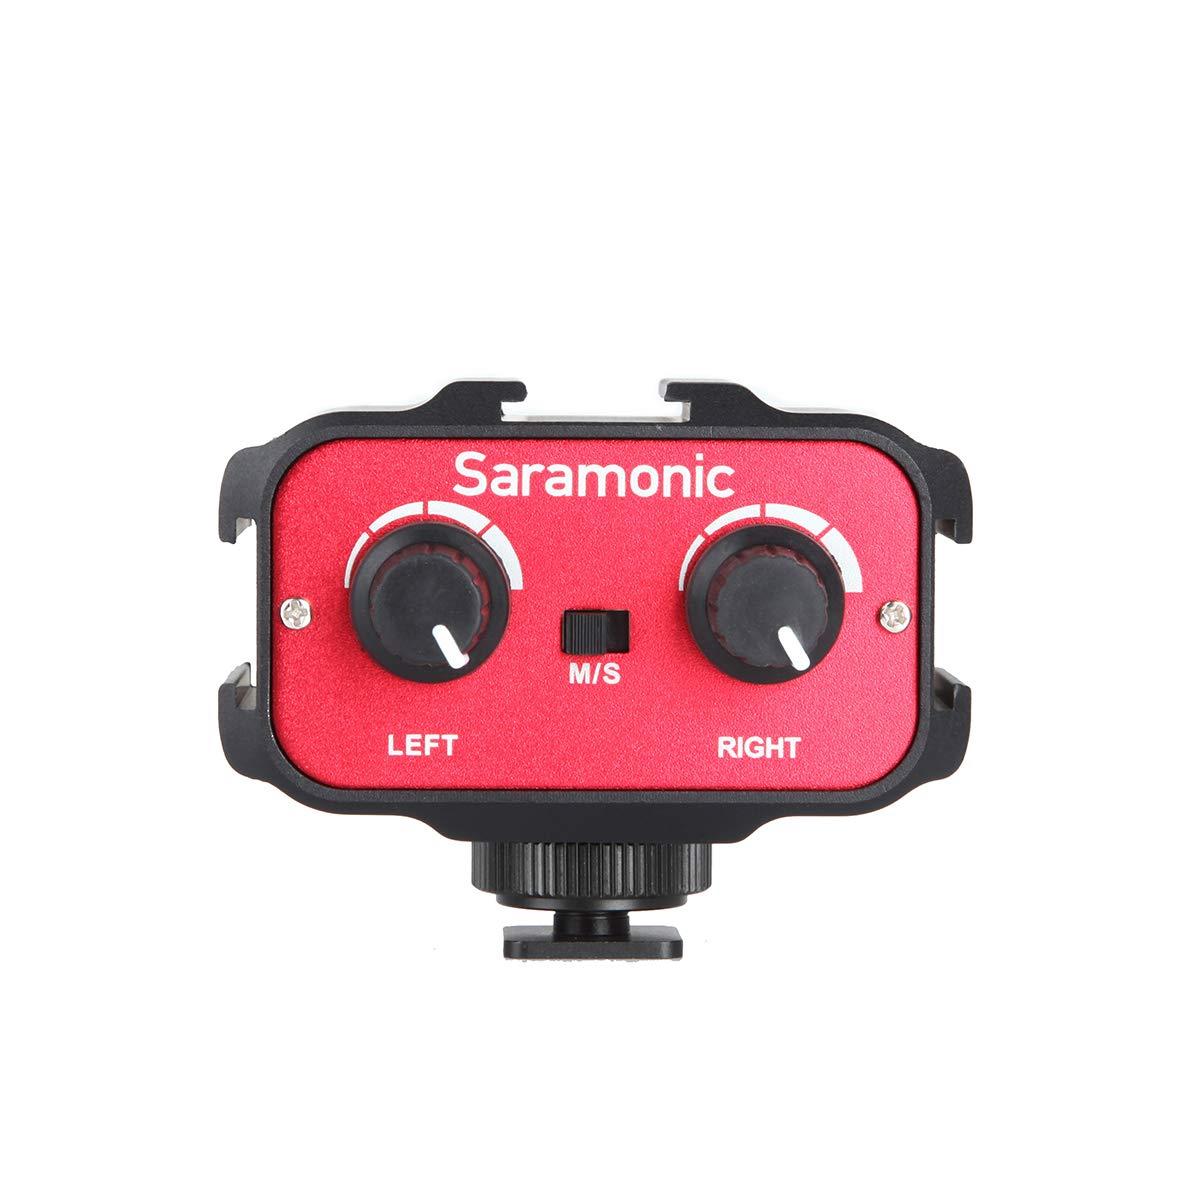 Saramonic SR-AX100 Audio Mixer Adapter Microphone Amplifier Universal Dual Channels 3.5mm Port Camera Mixer for Canon EOS Nikon Sony Panasonic DSLR Camera Camcorder